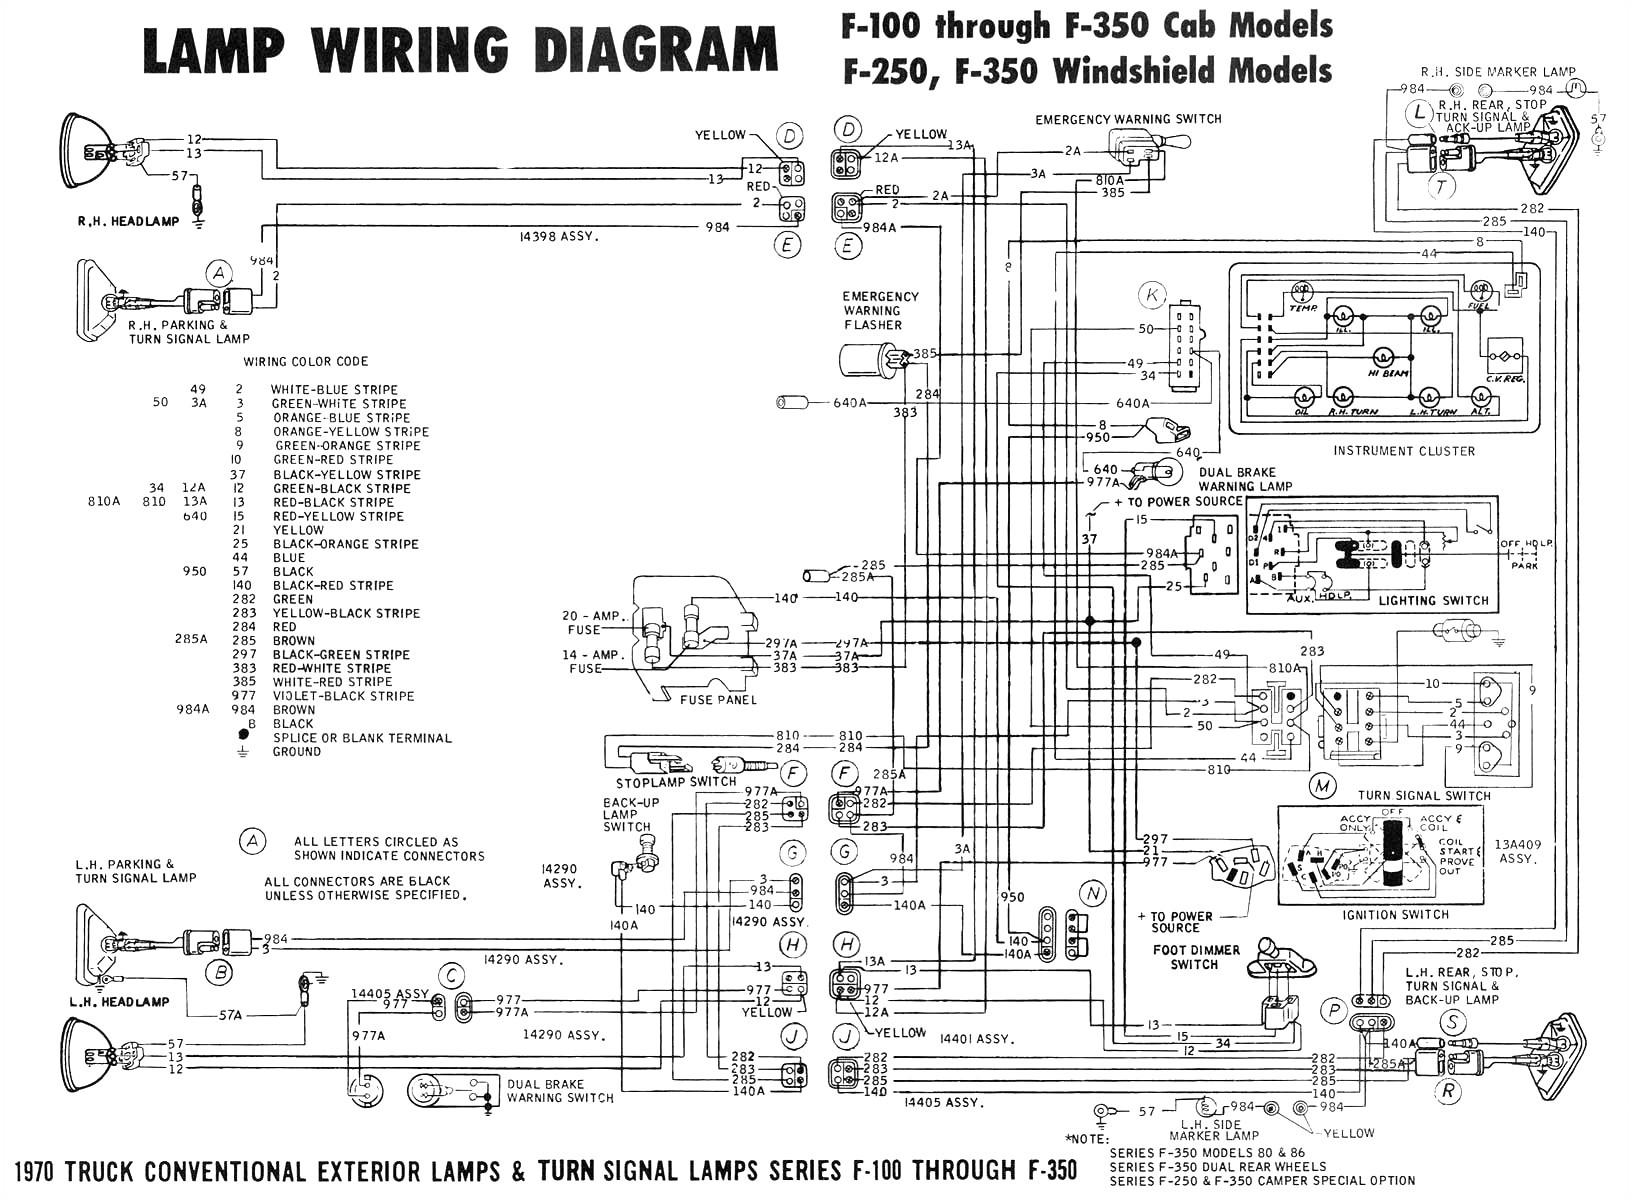 lgb train wiring diagrams wiring diagram schematiclgb 12070 wiring diagram diagram database reg lgb train wiring